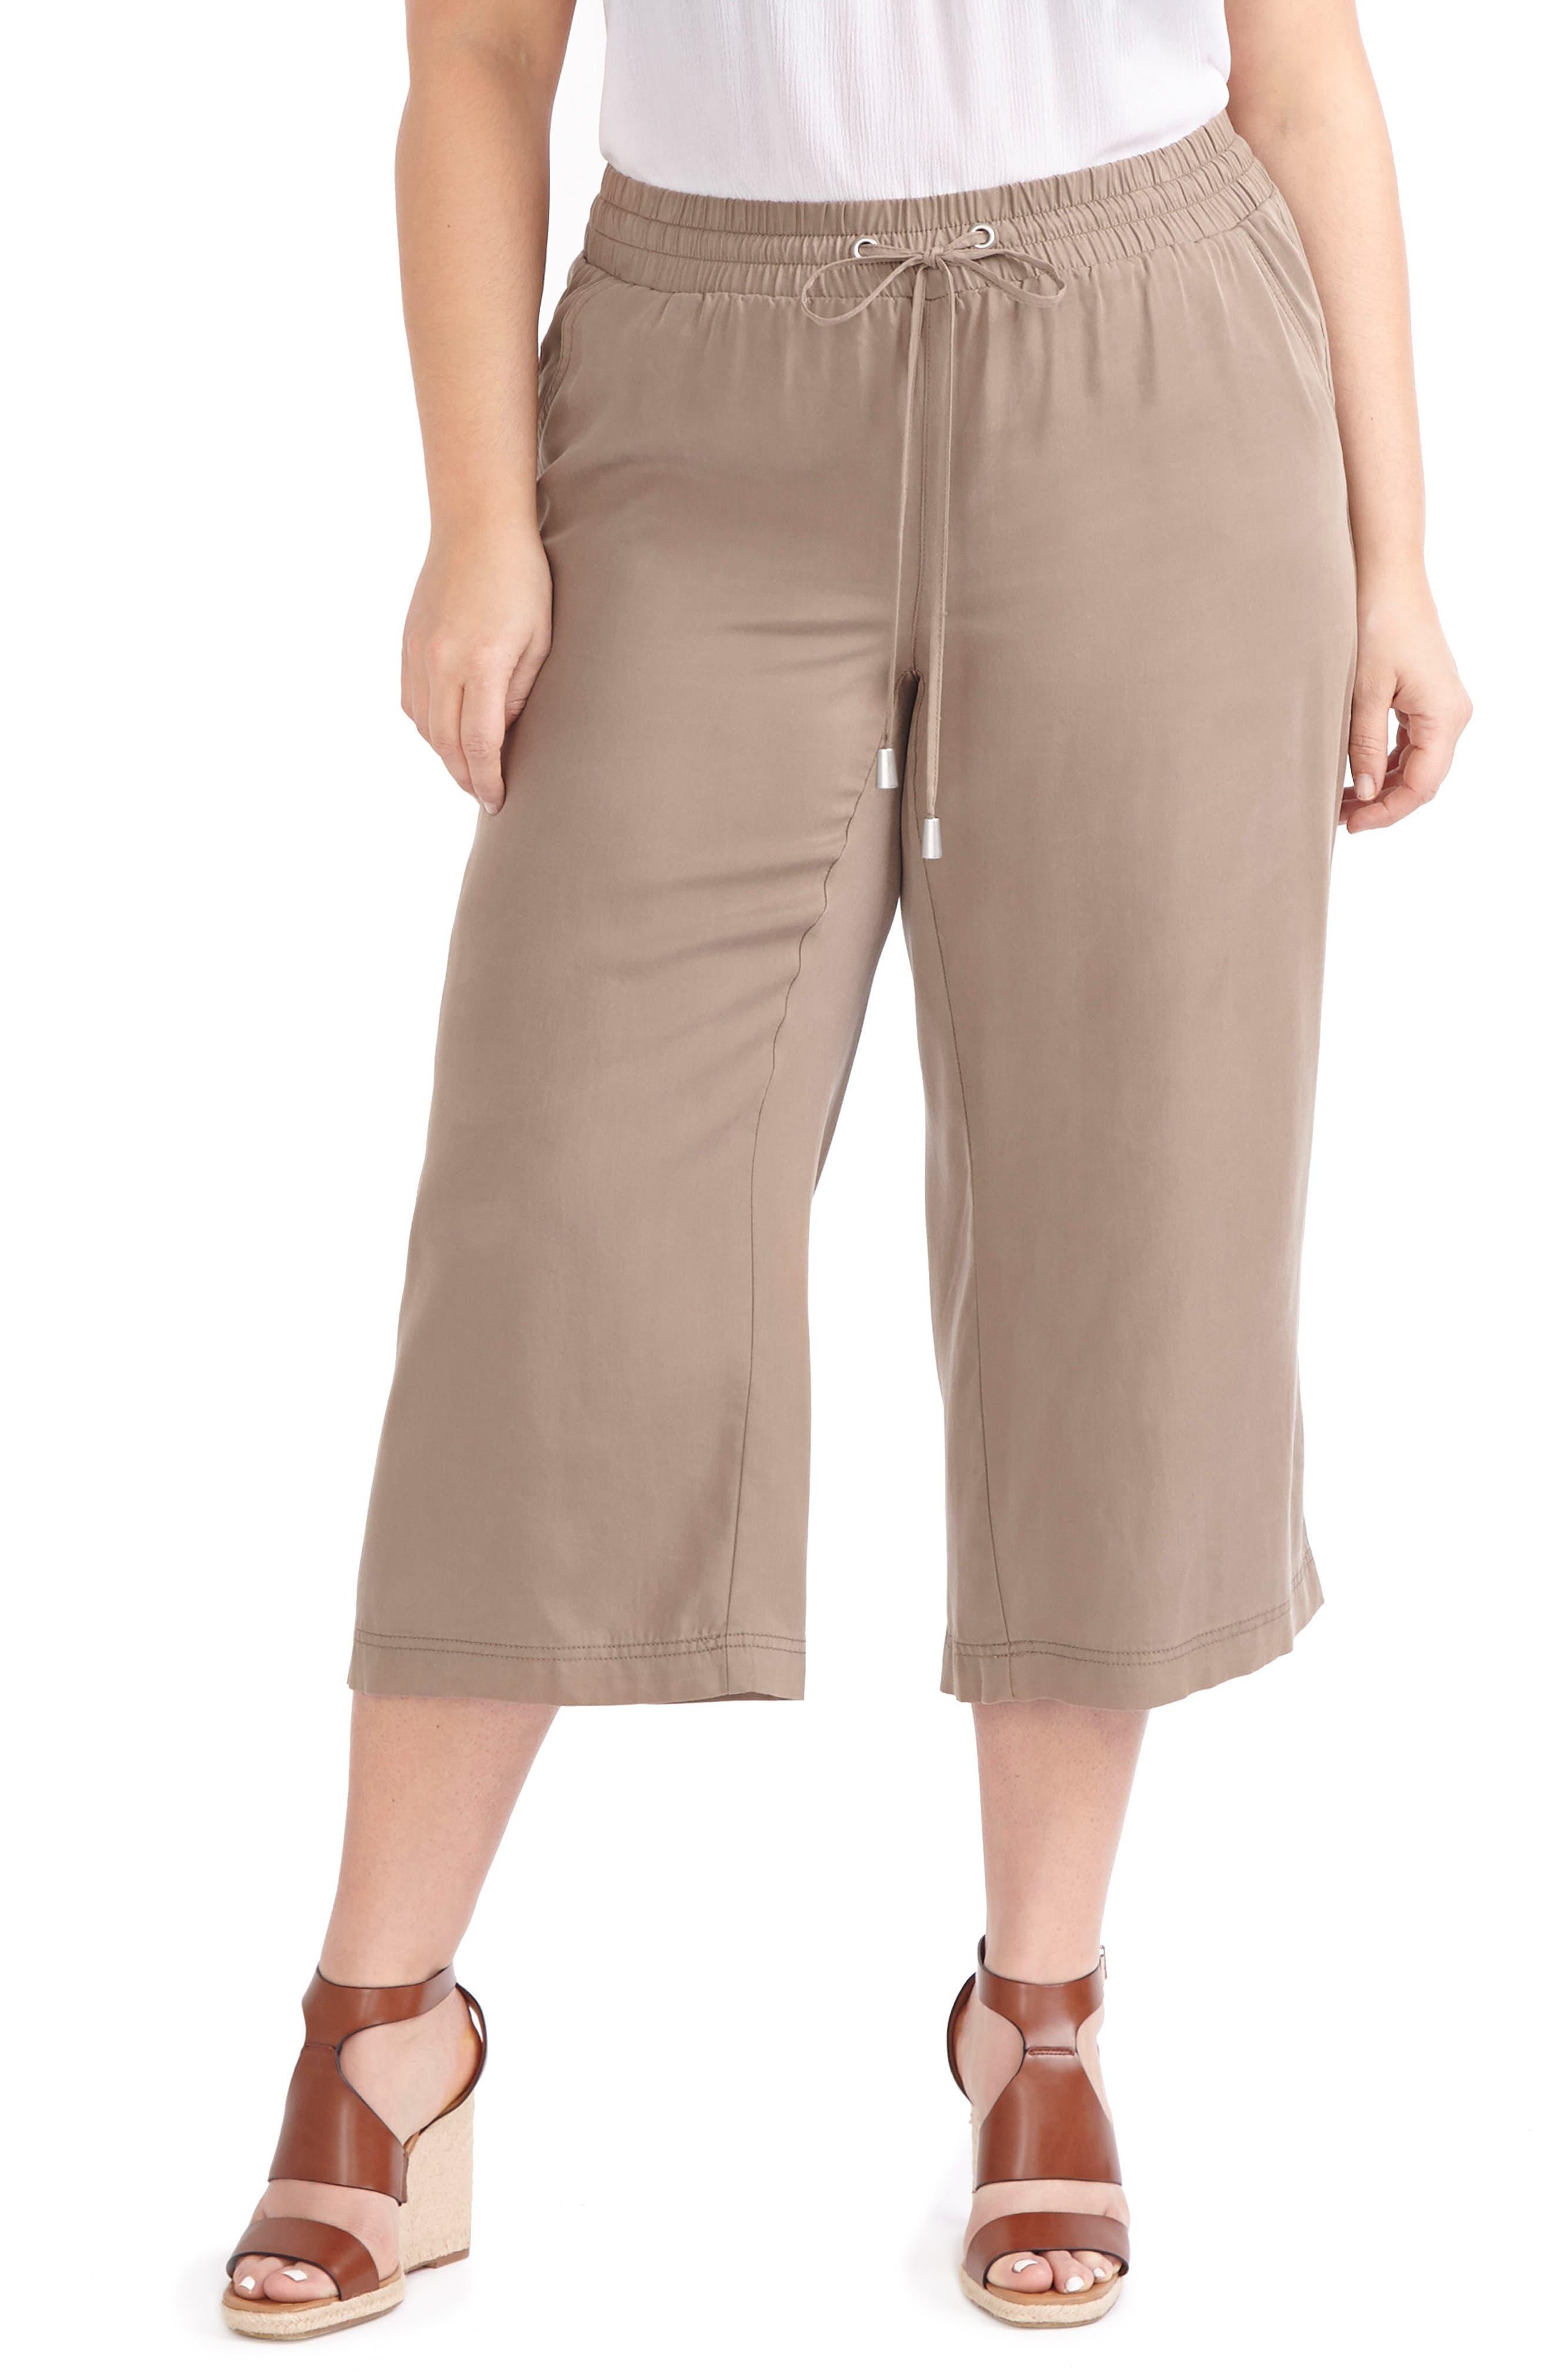 Alternate Image 1 Selected - ADDITION ELLE LOVE AND LEGEND Wide Leg Capri Pants (Plus Size)